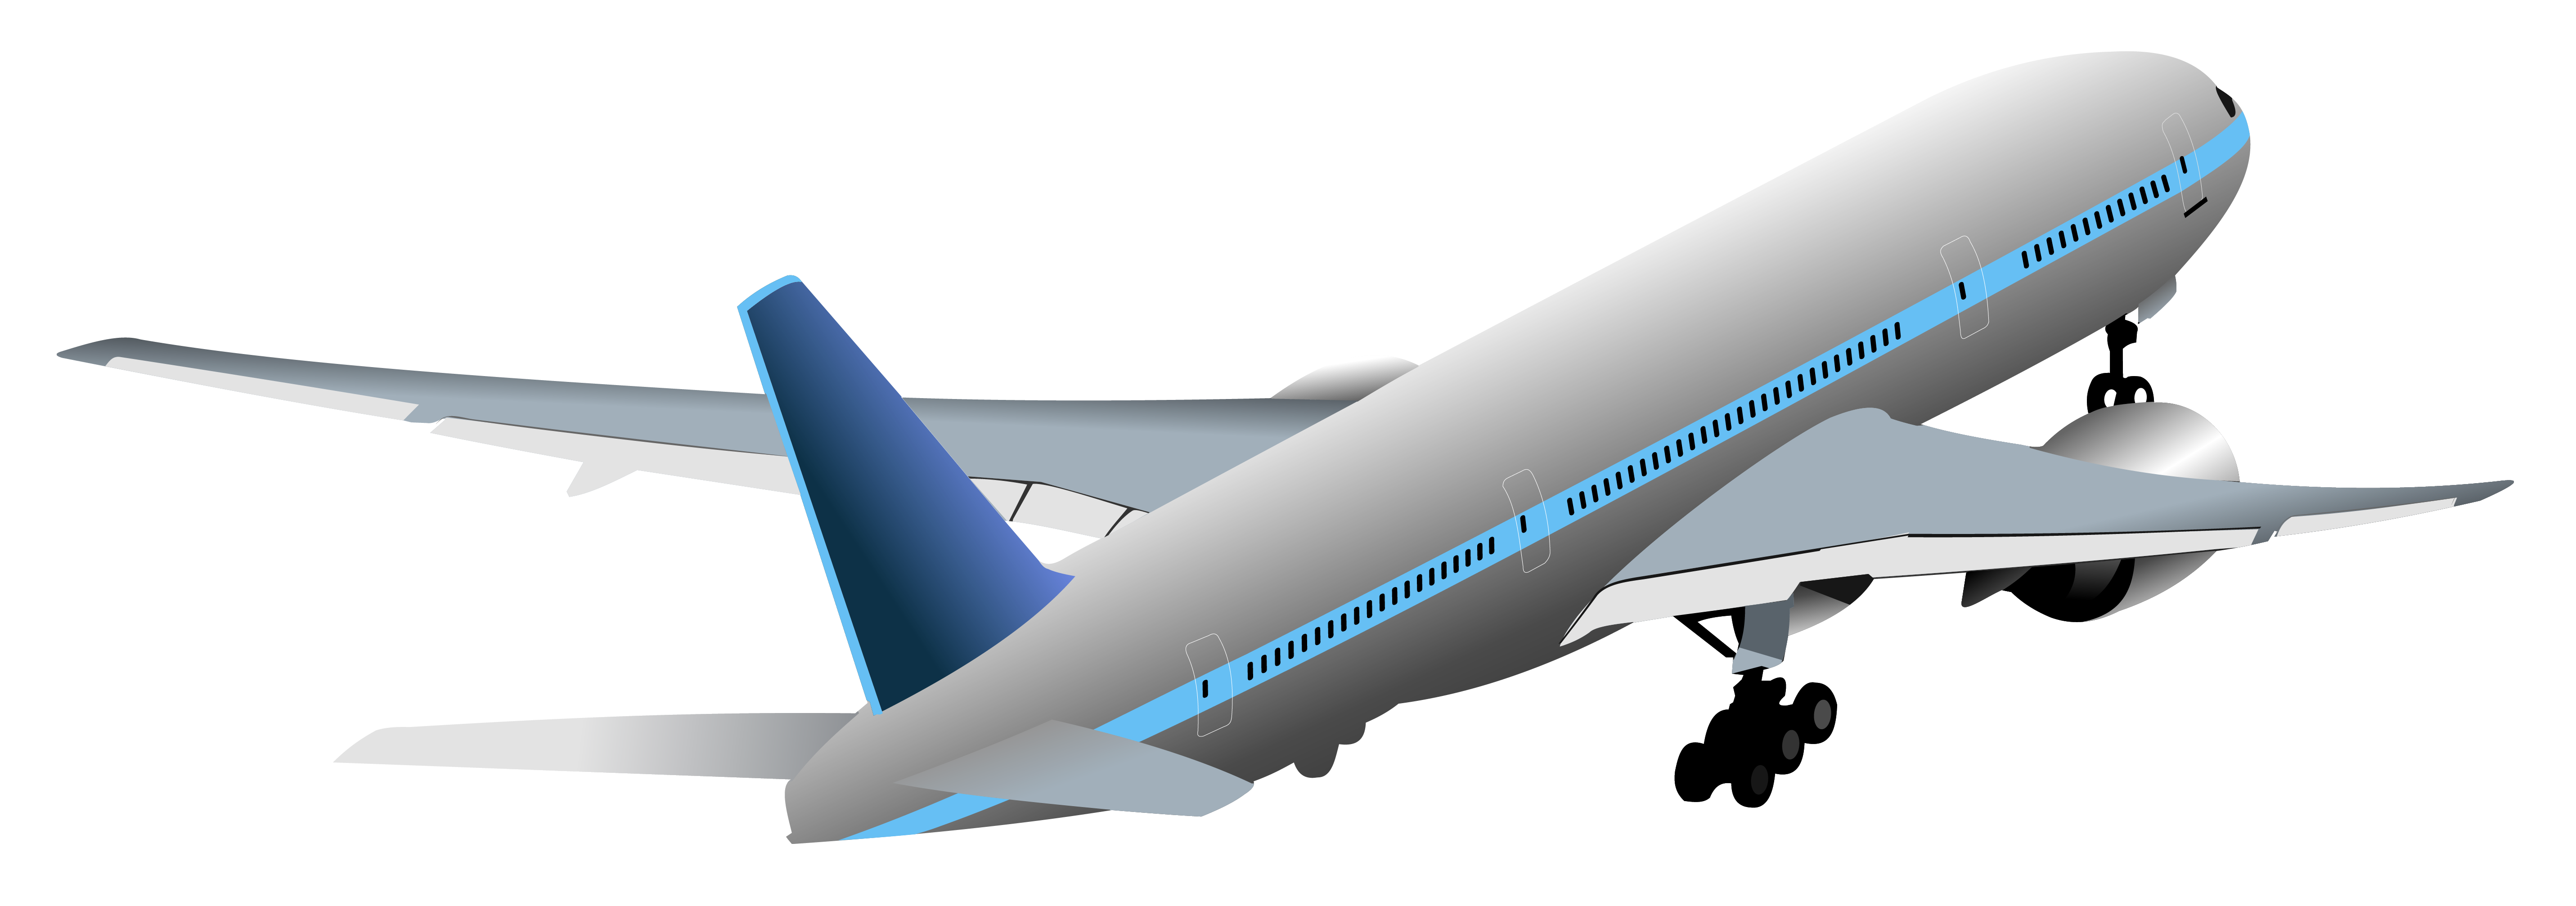 Aviation clipart vector Collection Aircraft Vector Aircraft download